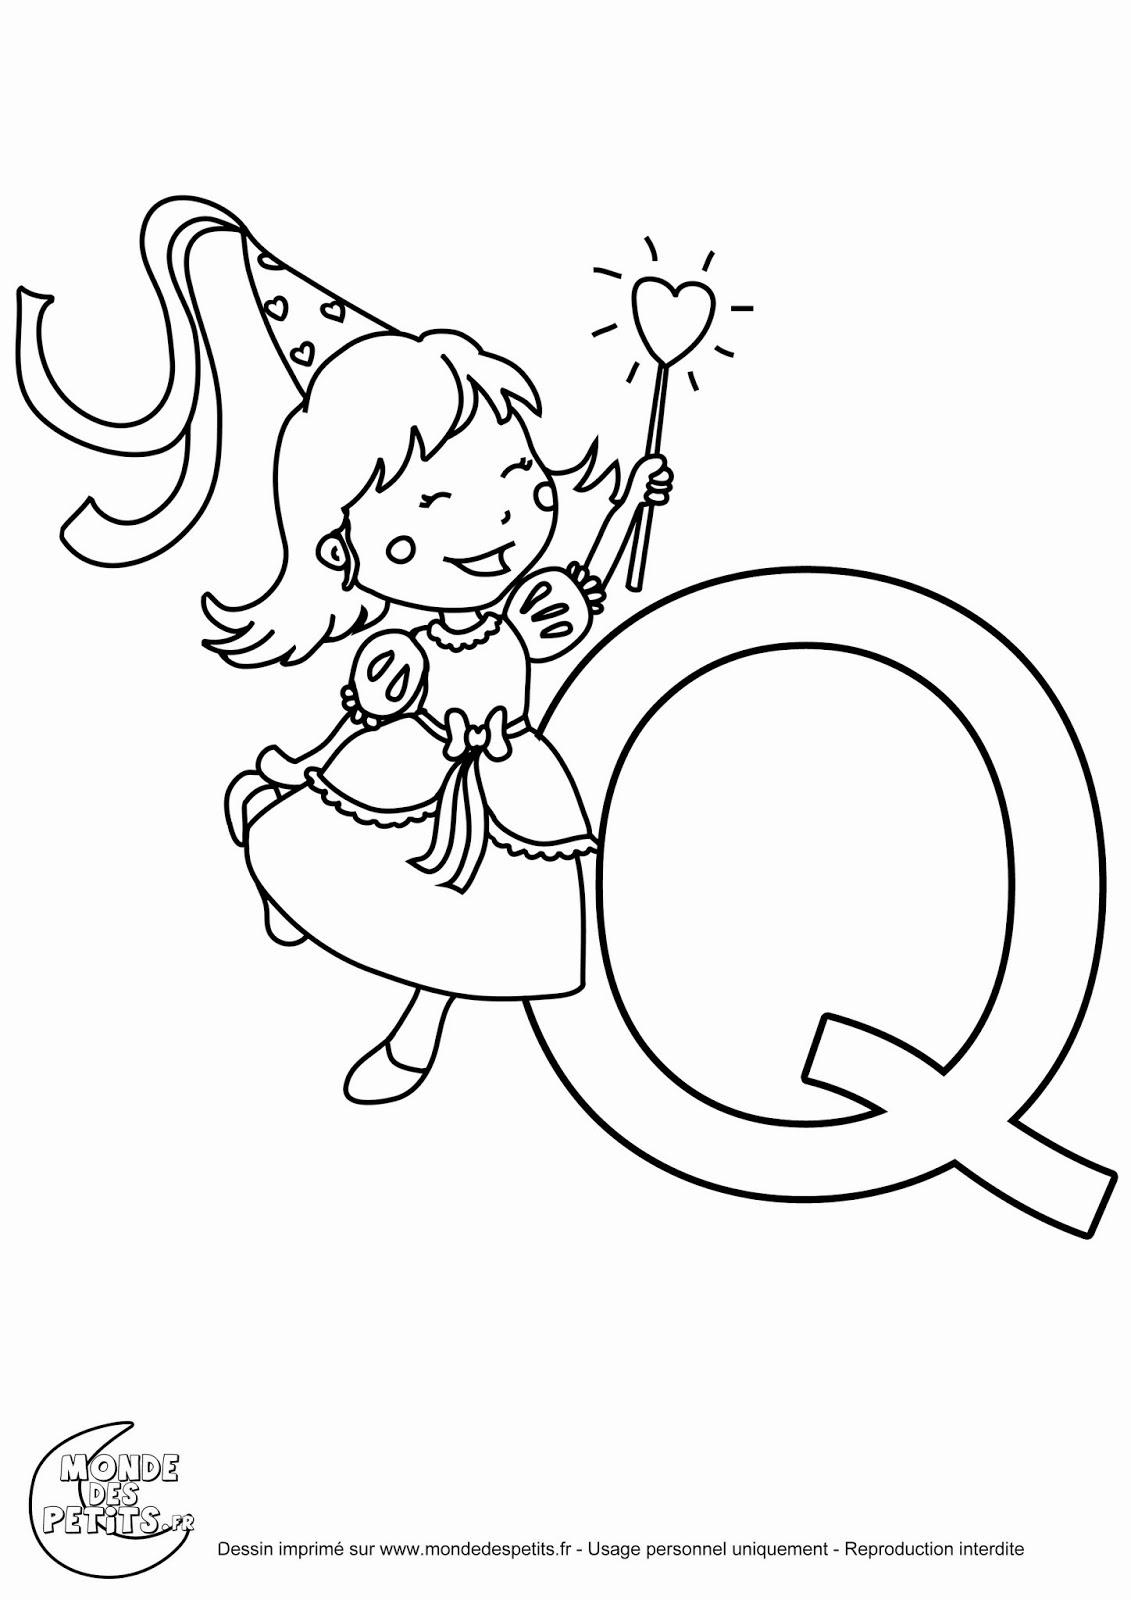 Sgblogosfera. María José Argüeso: Coloriage Alphabet Princesse pour Coloriage Alphabet Complet A Imprimer